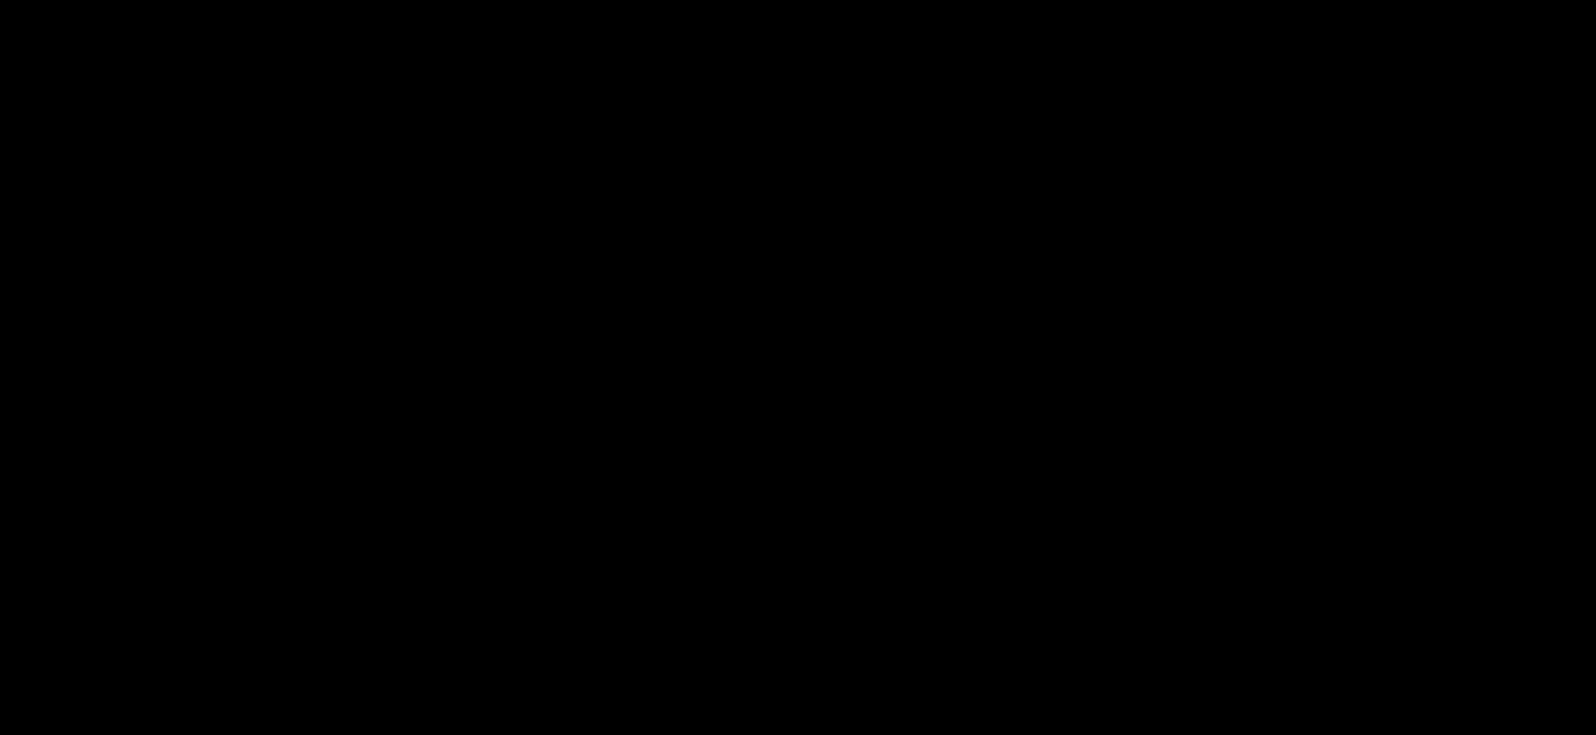 trans-Latanoprost Acid